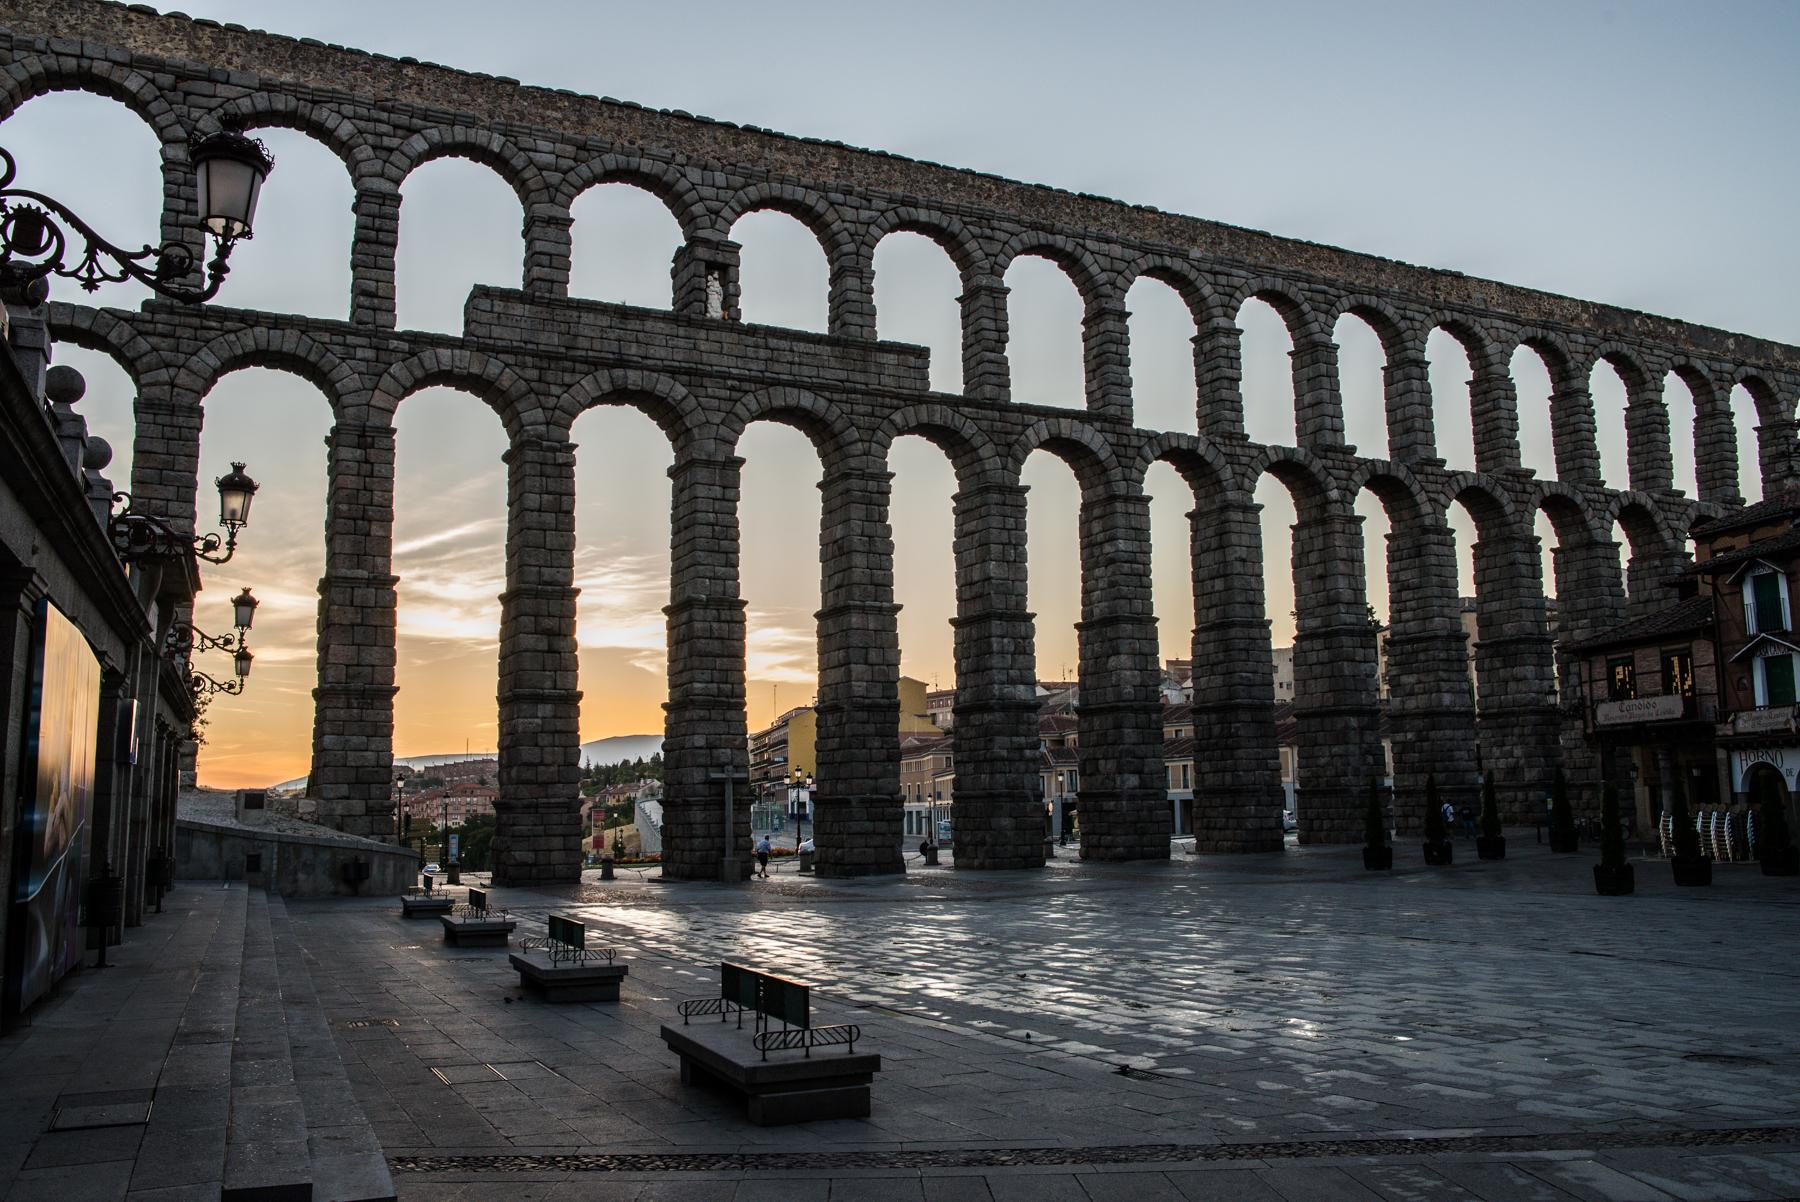 File:Acueducto de Segovia, al amanecer (2).jpg - Wikimedia Commons